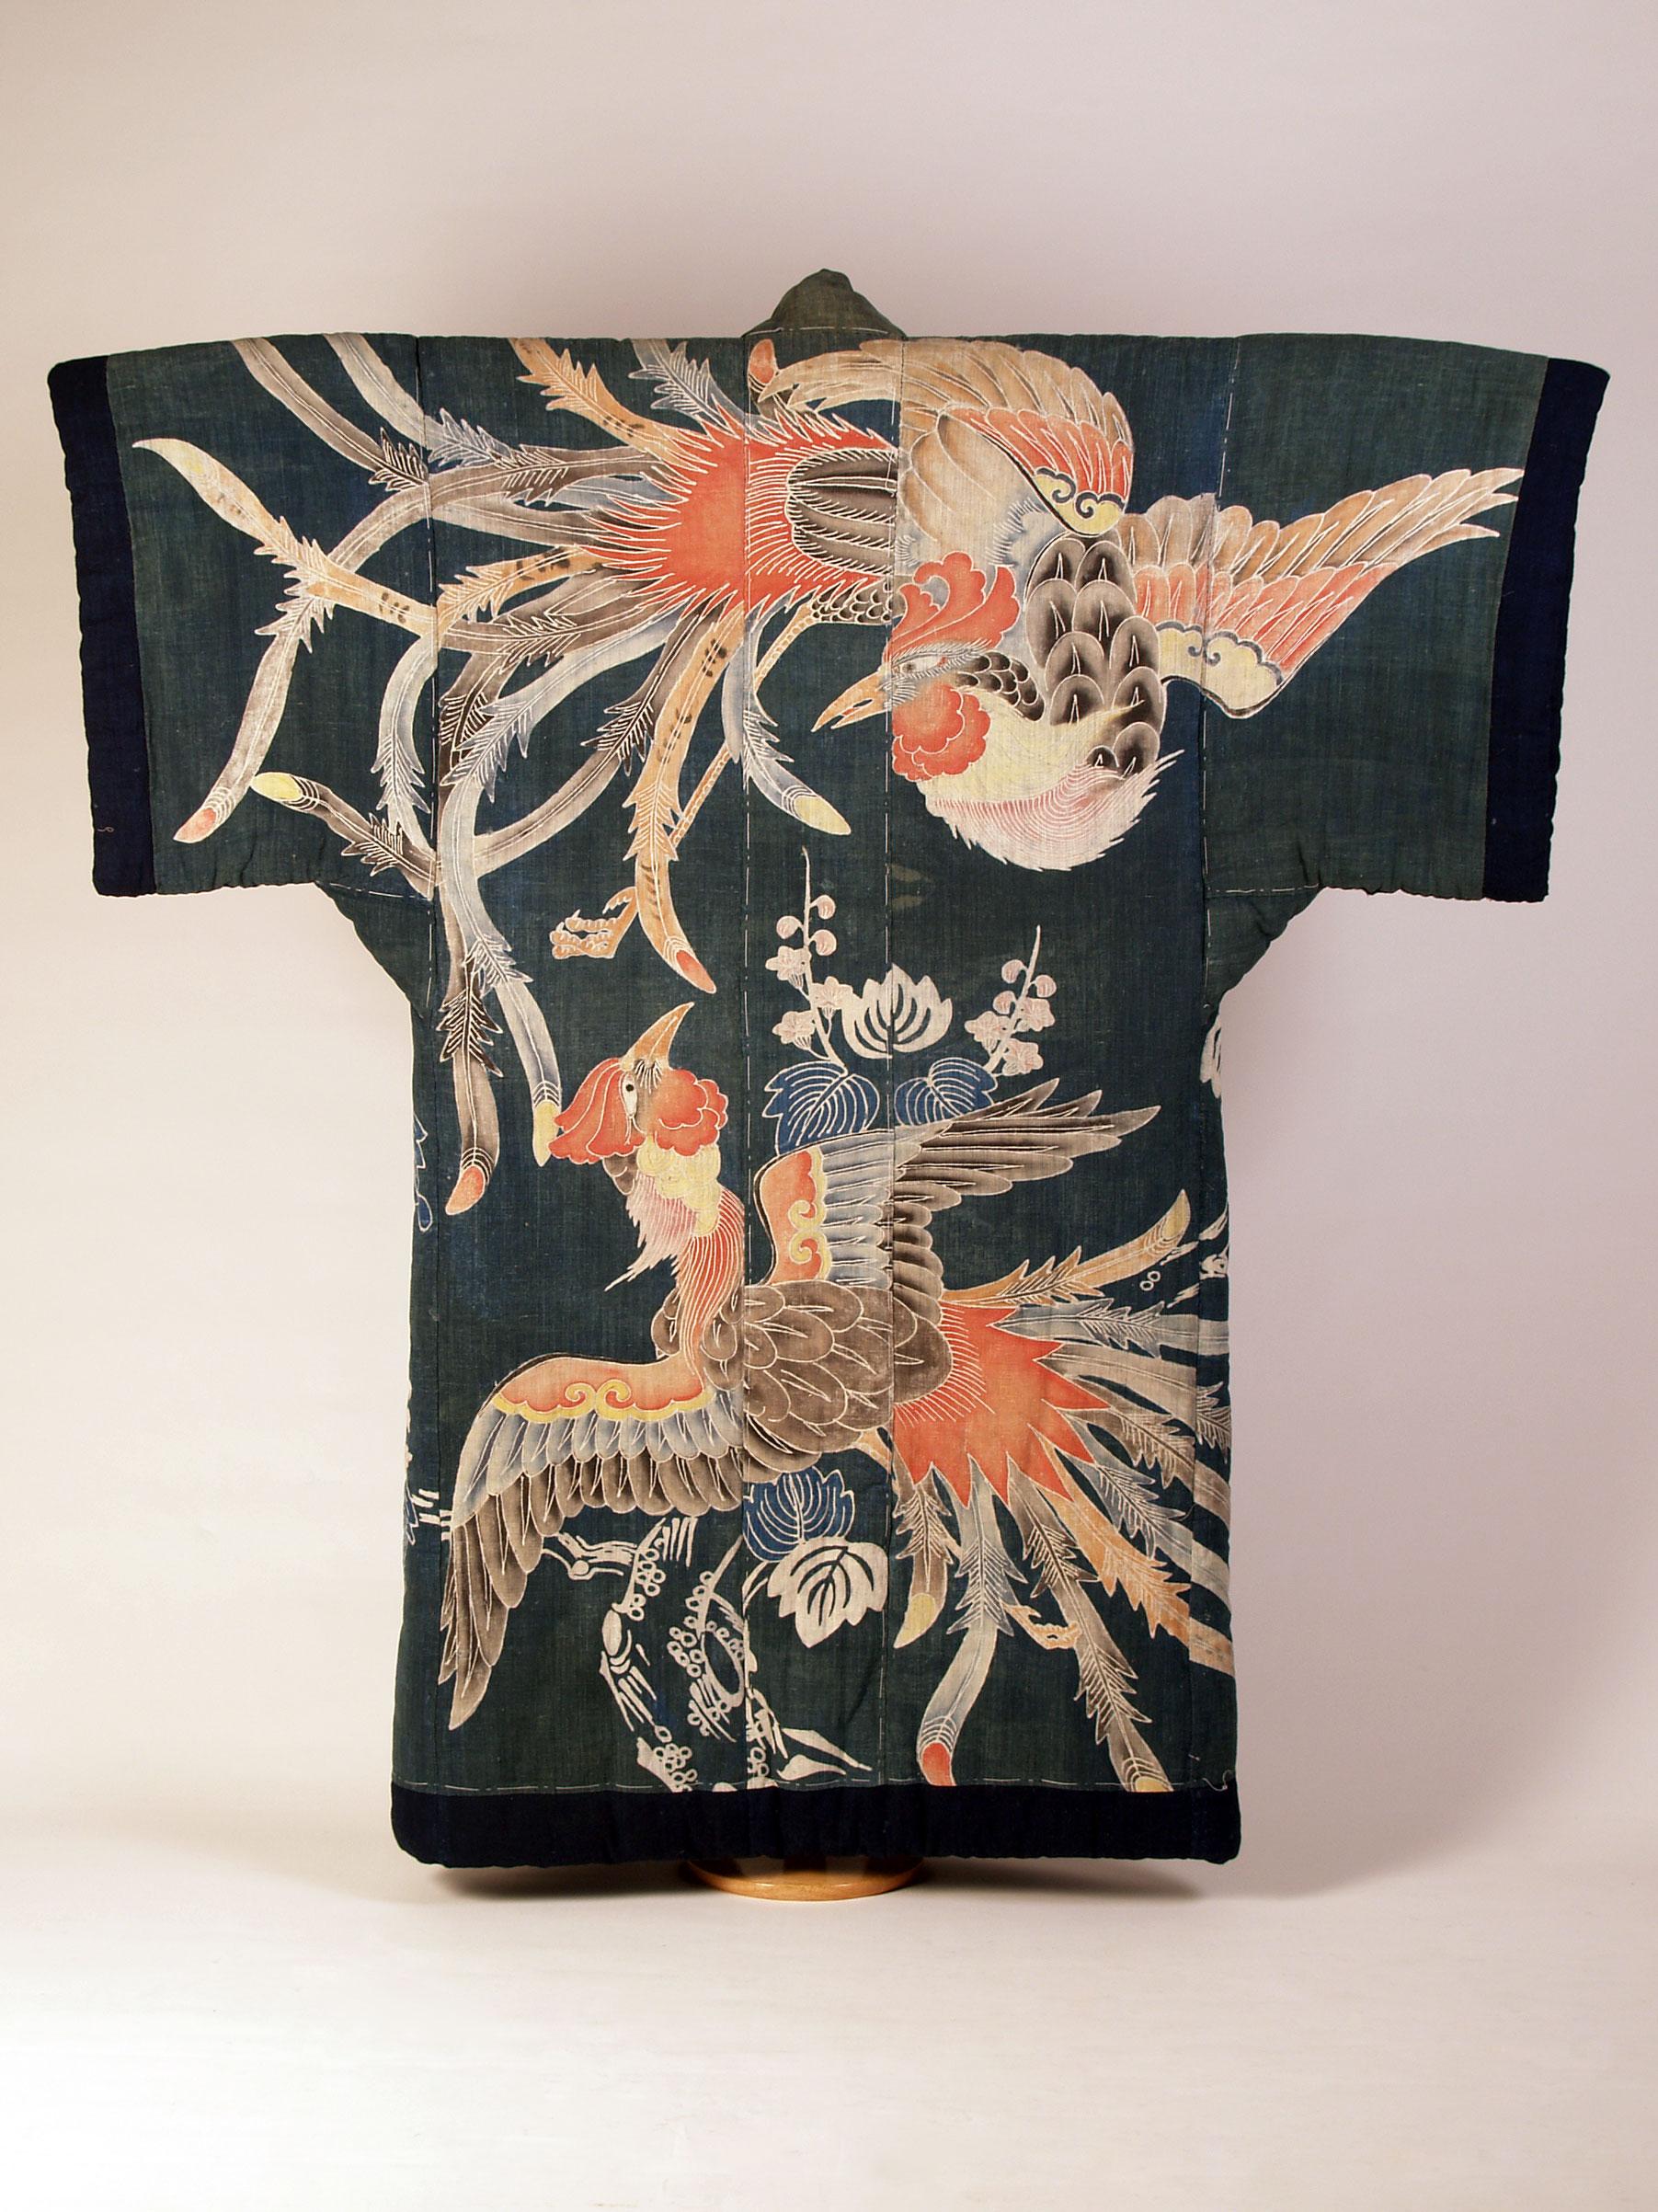 Kimono-shaped futon cover with design of phoenixes